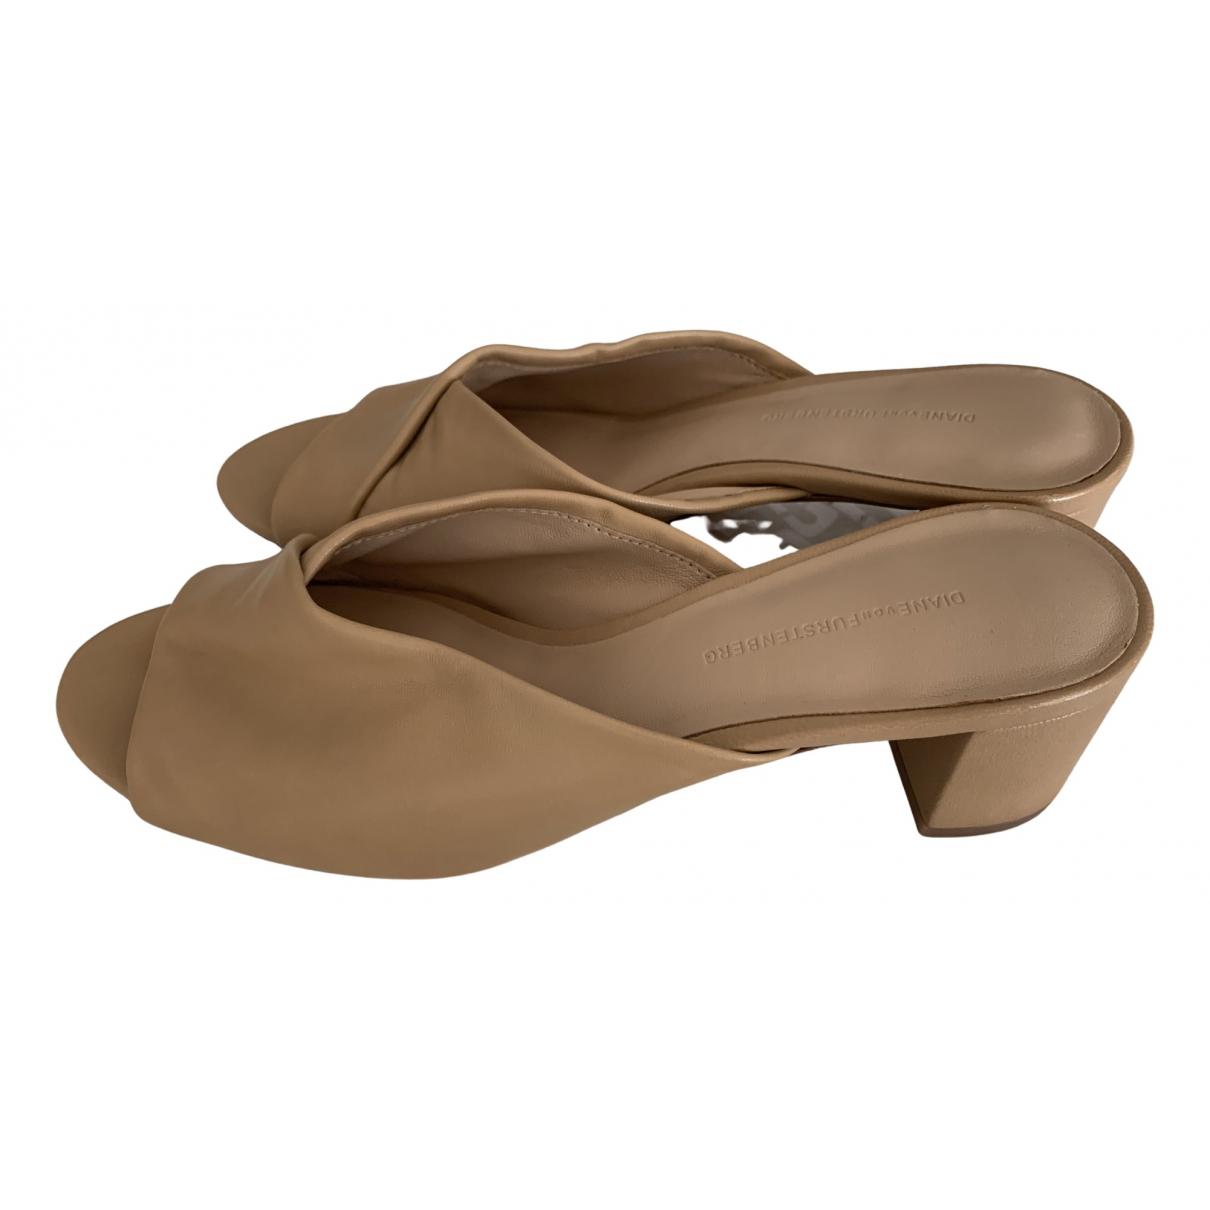 Diane Von Furstenberg - Sandales   pour femme en cuir - beige